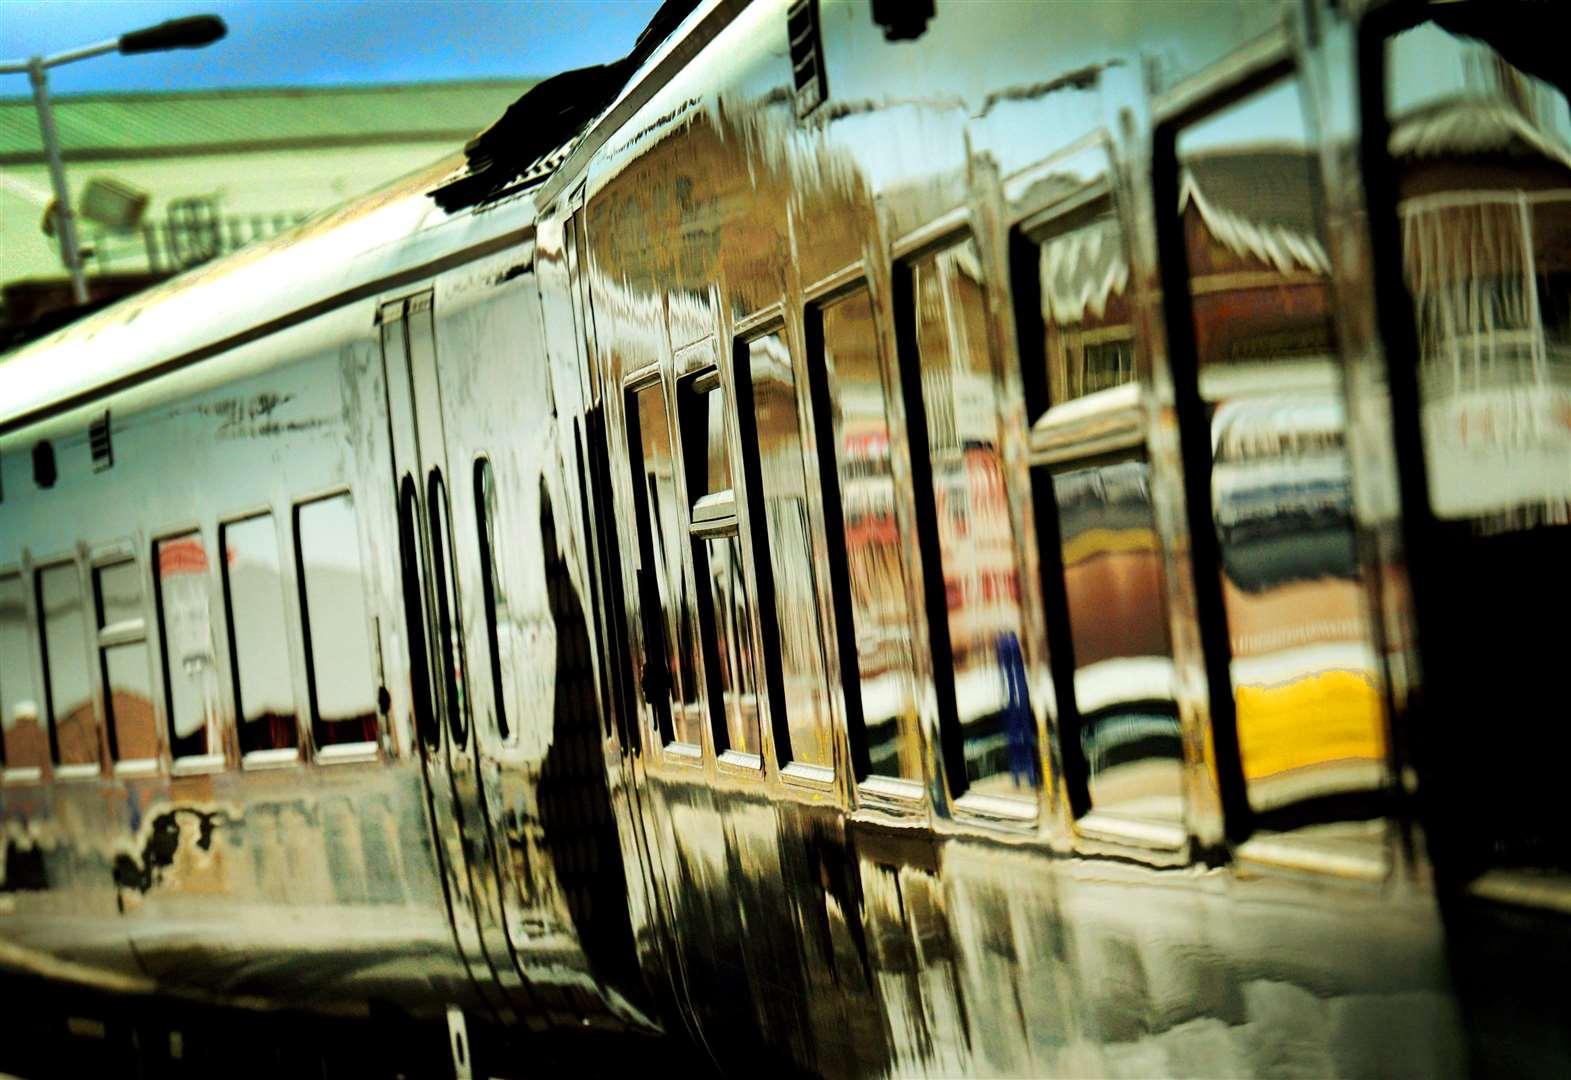 Sheep on line spark train cancellation